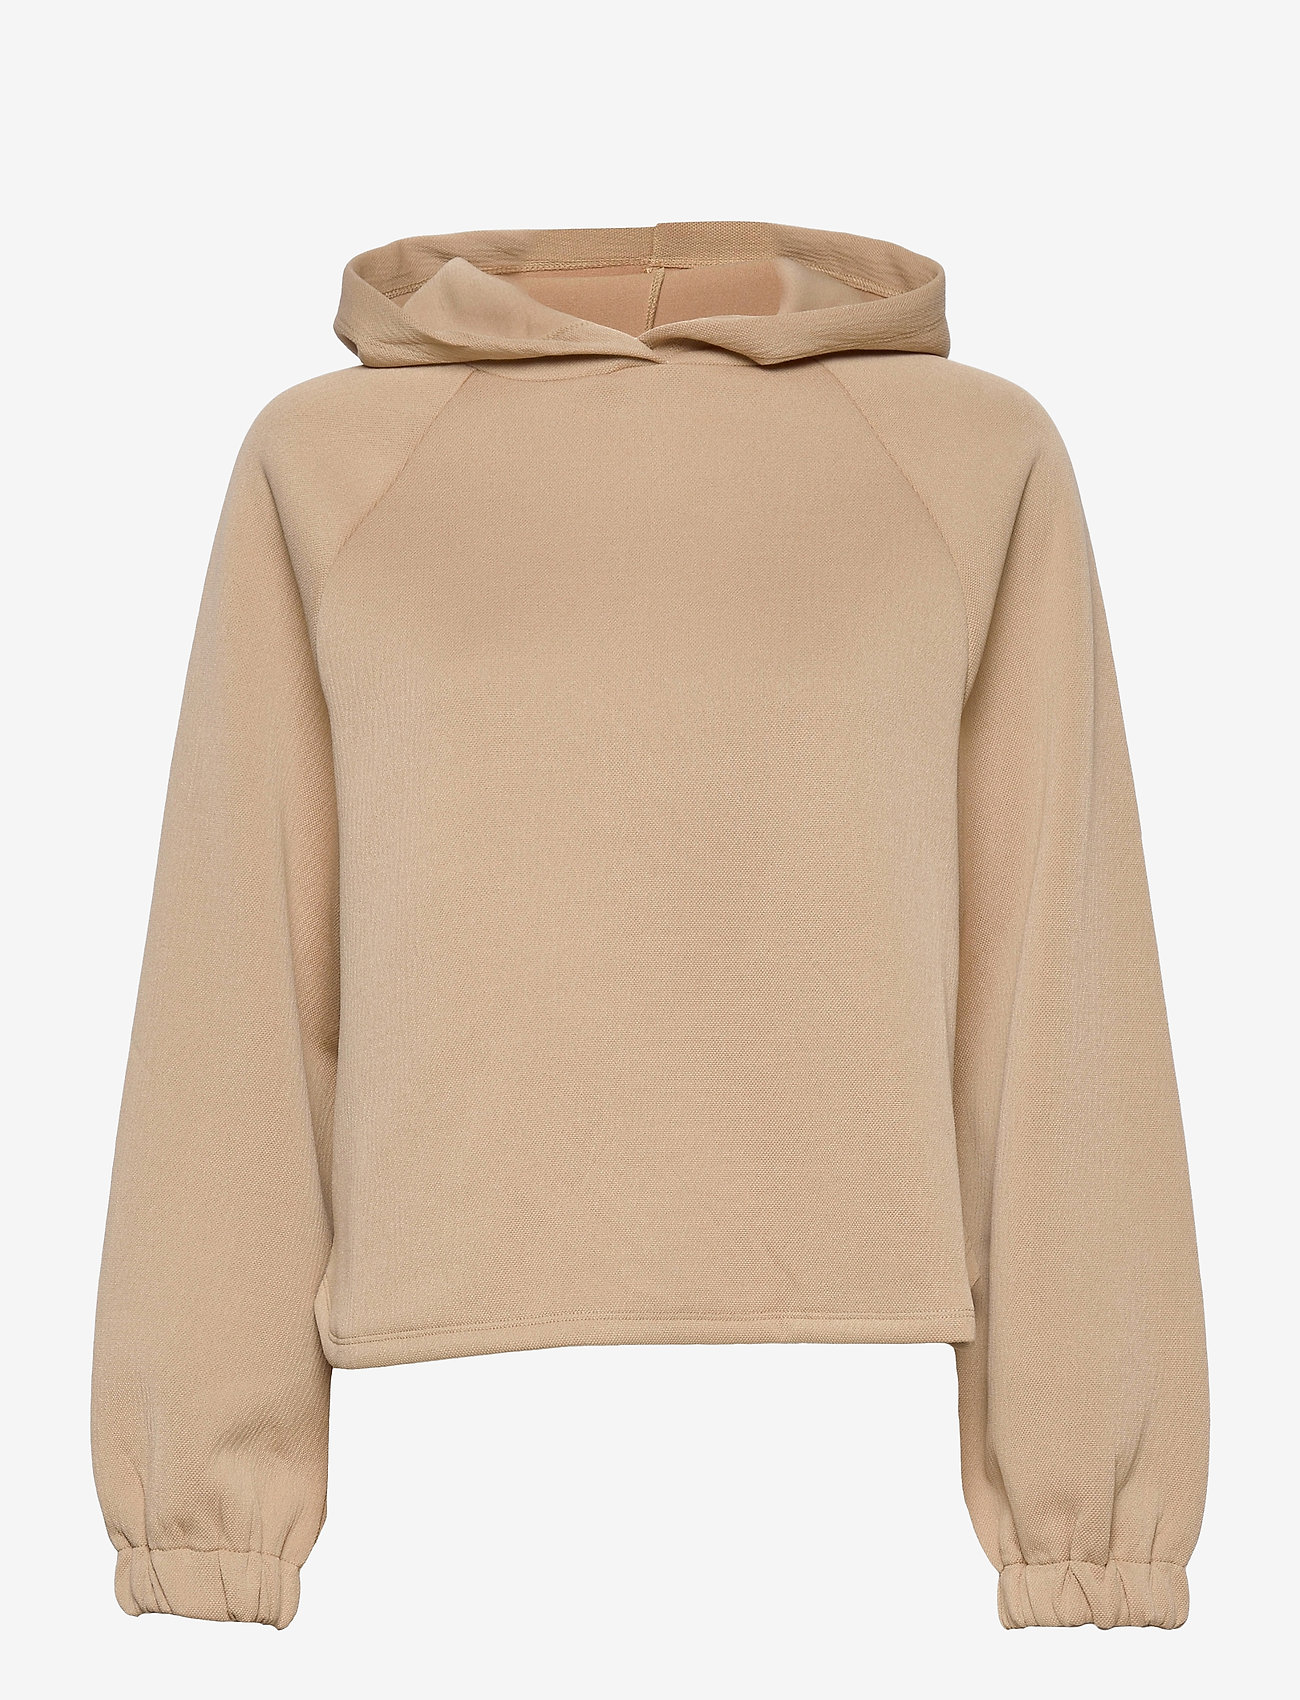 Mango - TAMMY - hættetrøjer - light beige - 1